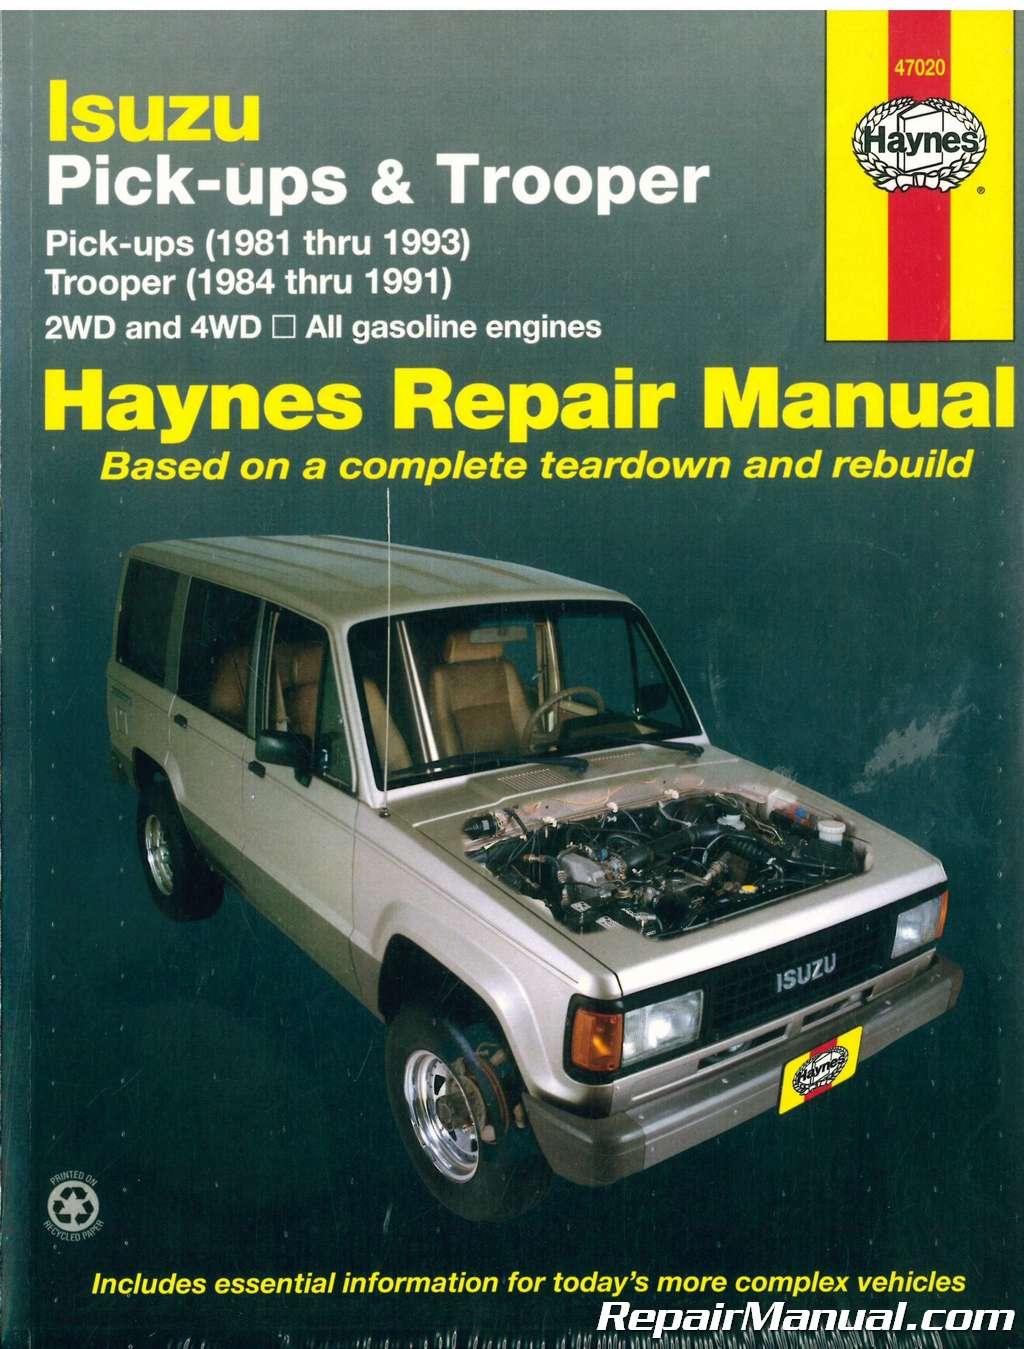 haynes isuzu trooper pick ups 1981 1993 auto repair manual rh repairmanual com 1991 isuzu trooper owners manual pdf 1991 isuzu trooper owners manual pdf